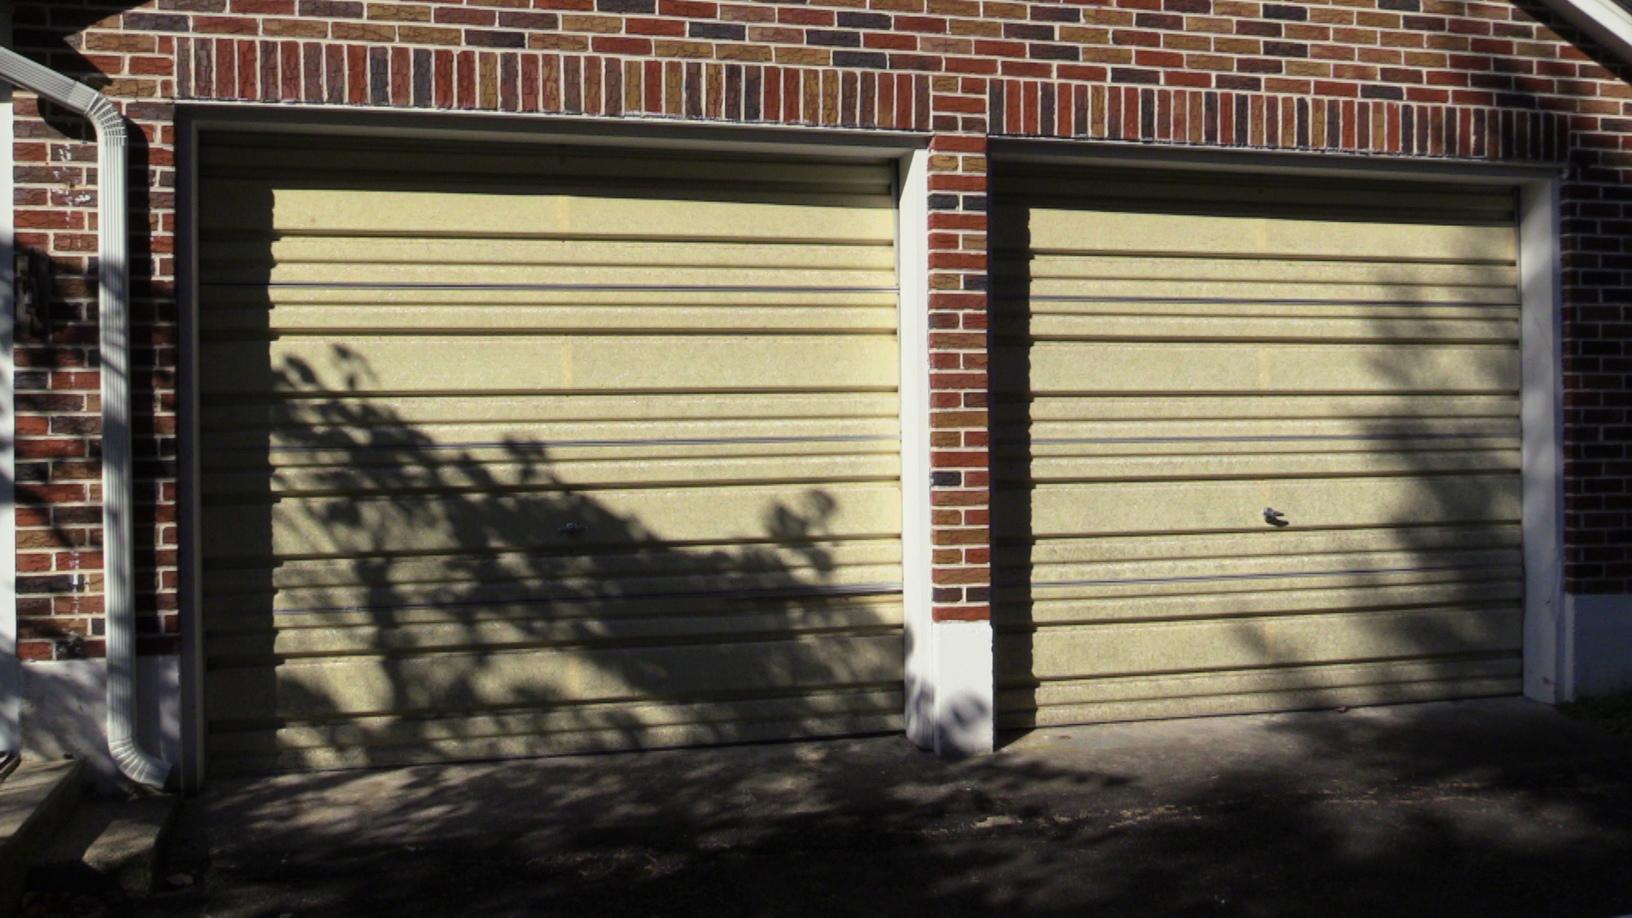 Dual Garage Doors to Be Replaced